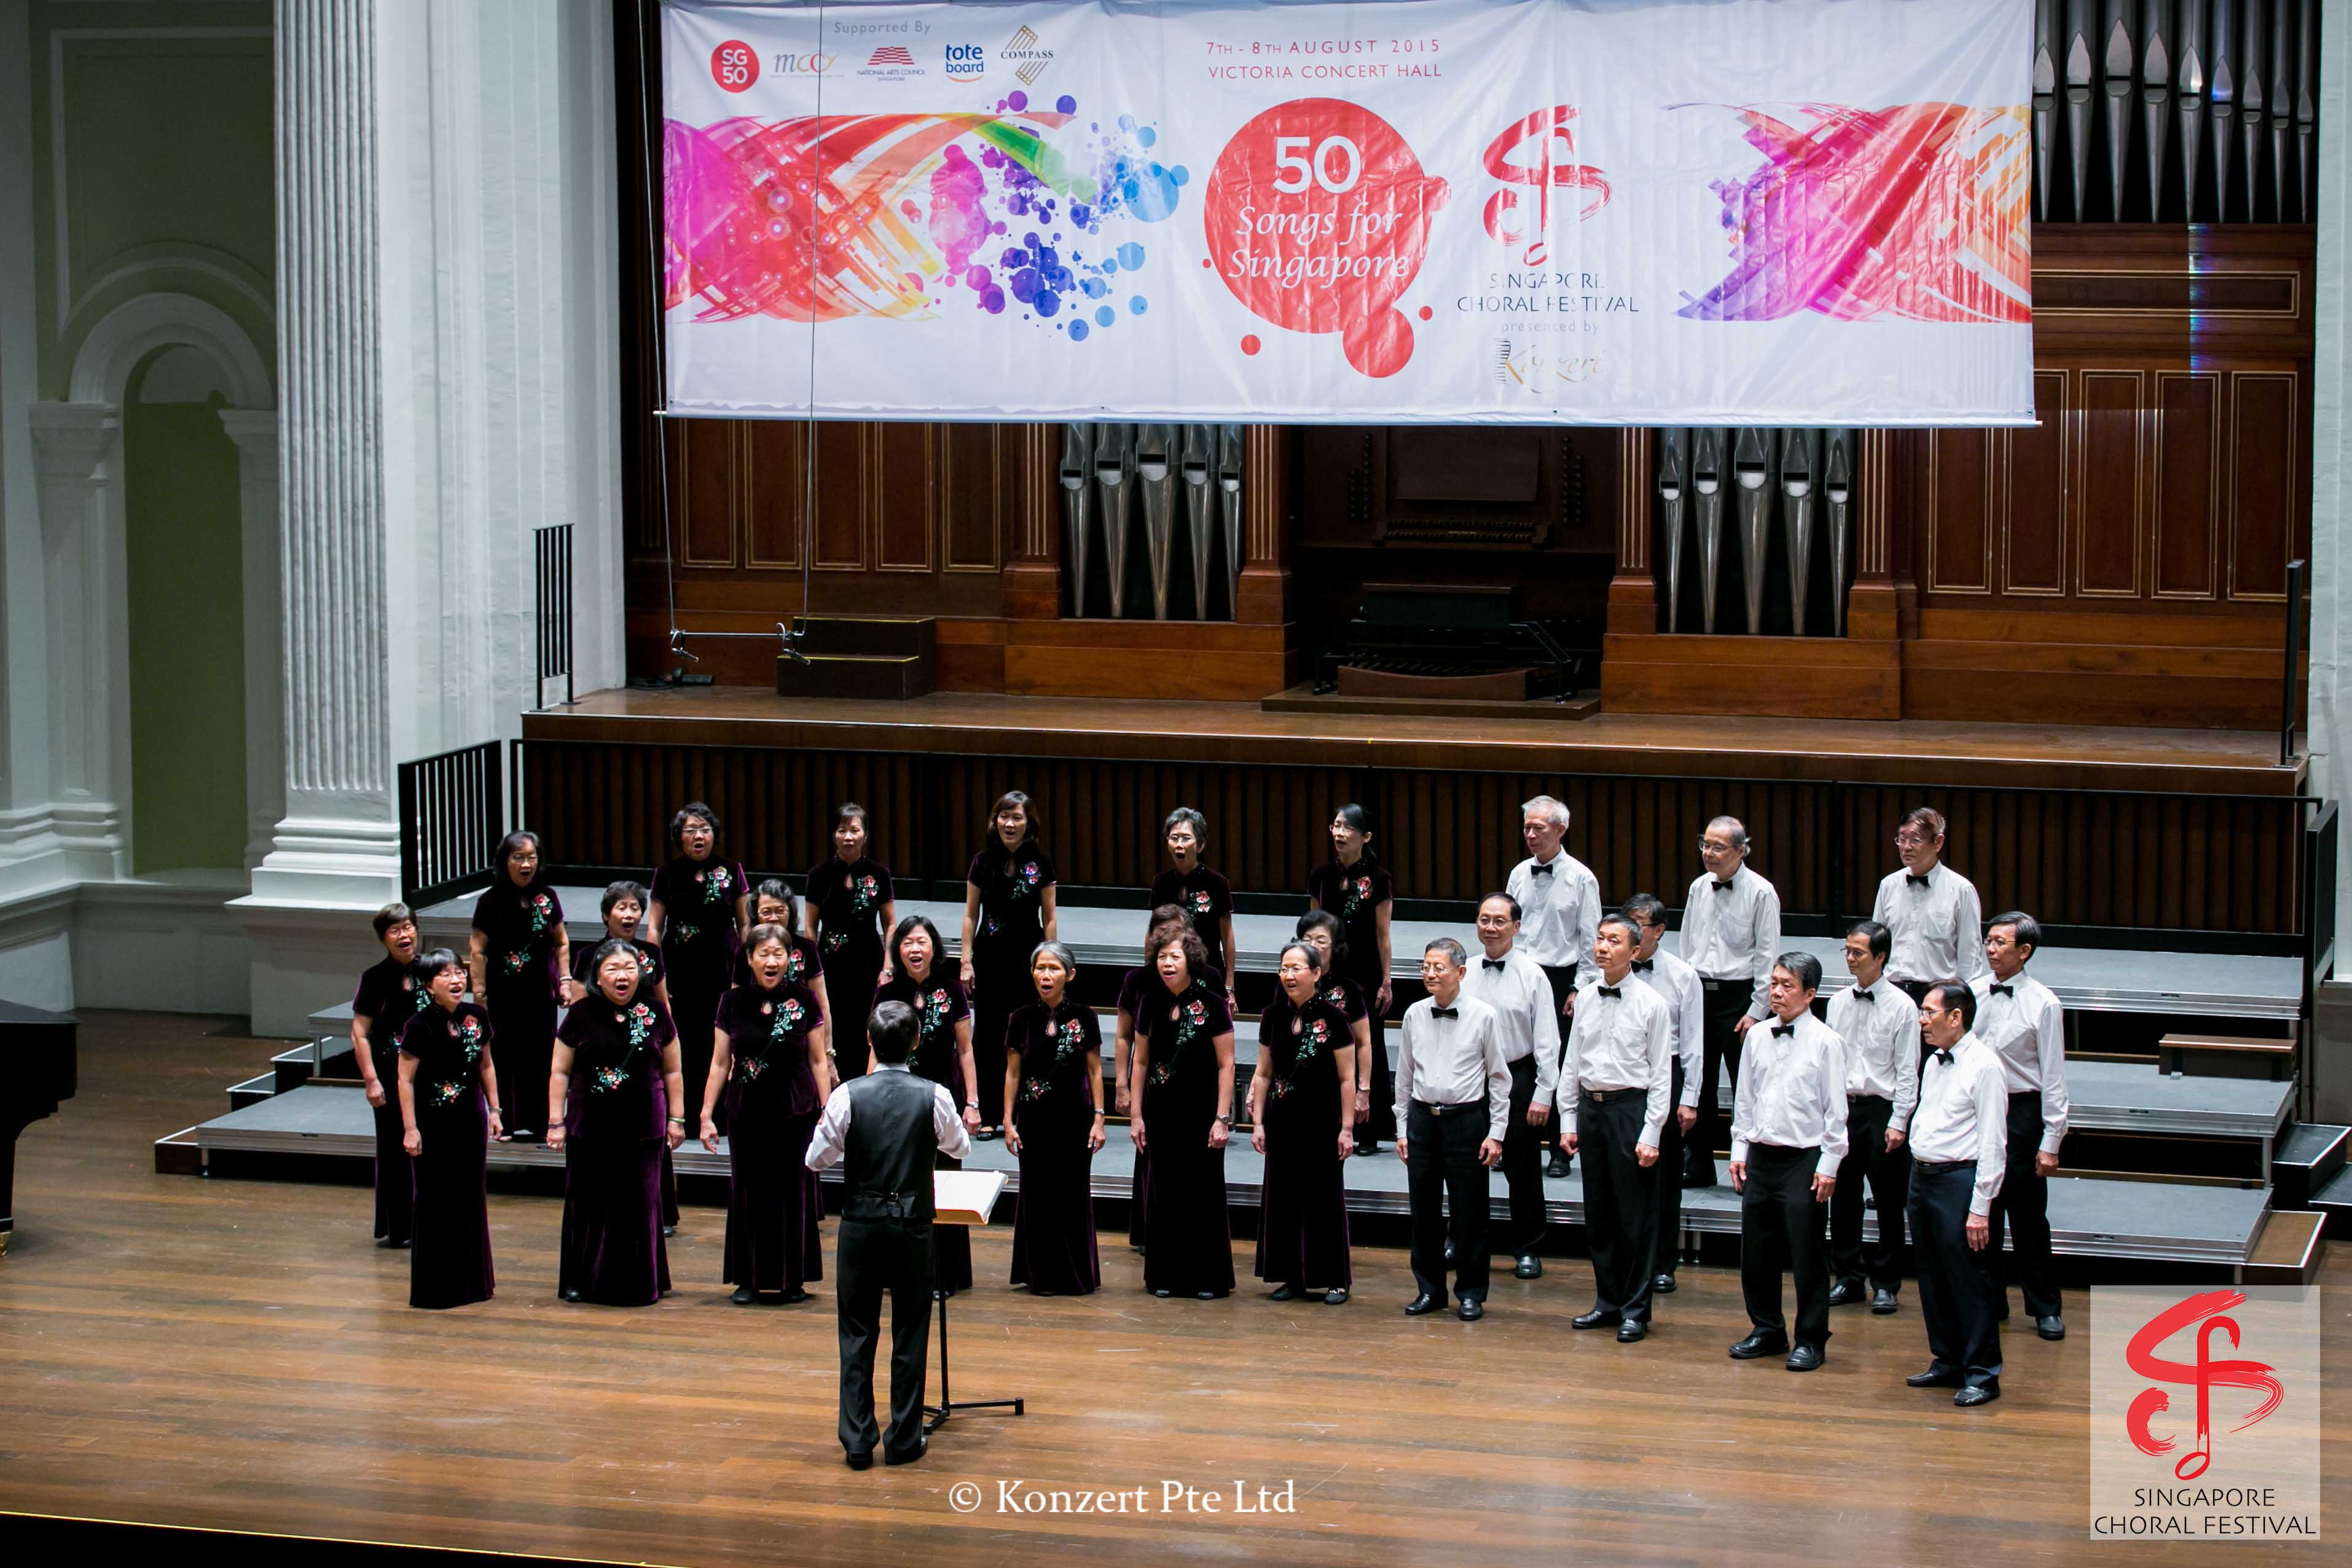 Singapore Choral Festival 8-8-15 (203).jpg